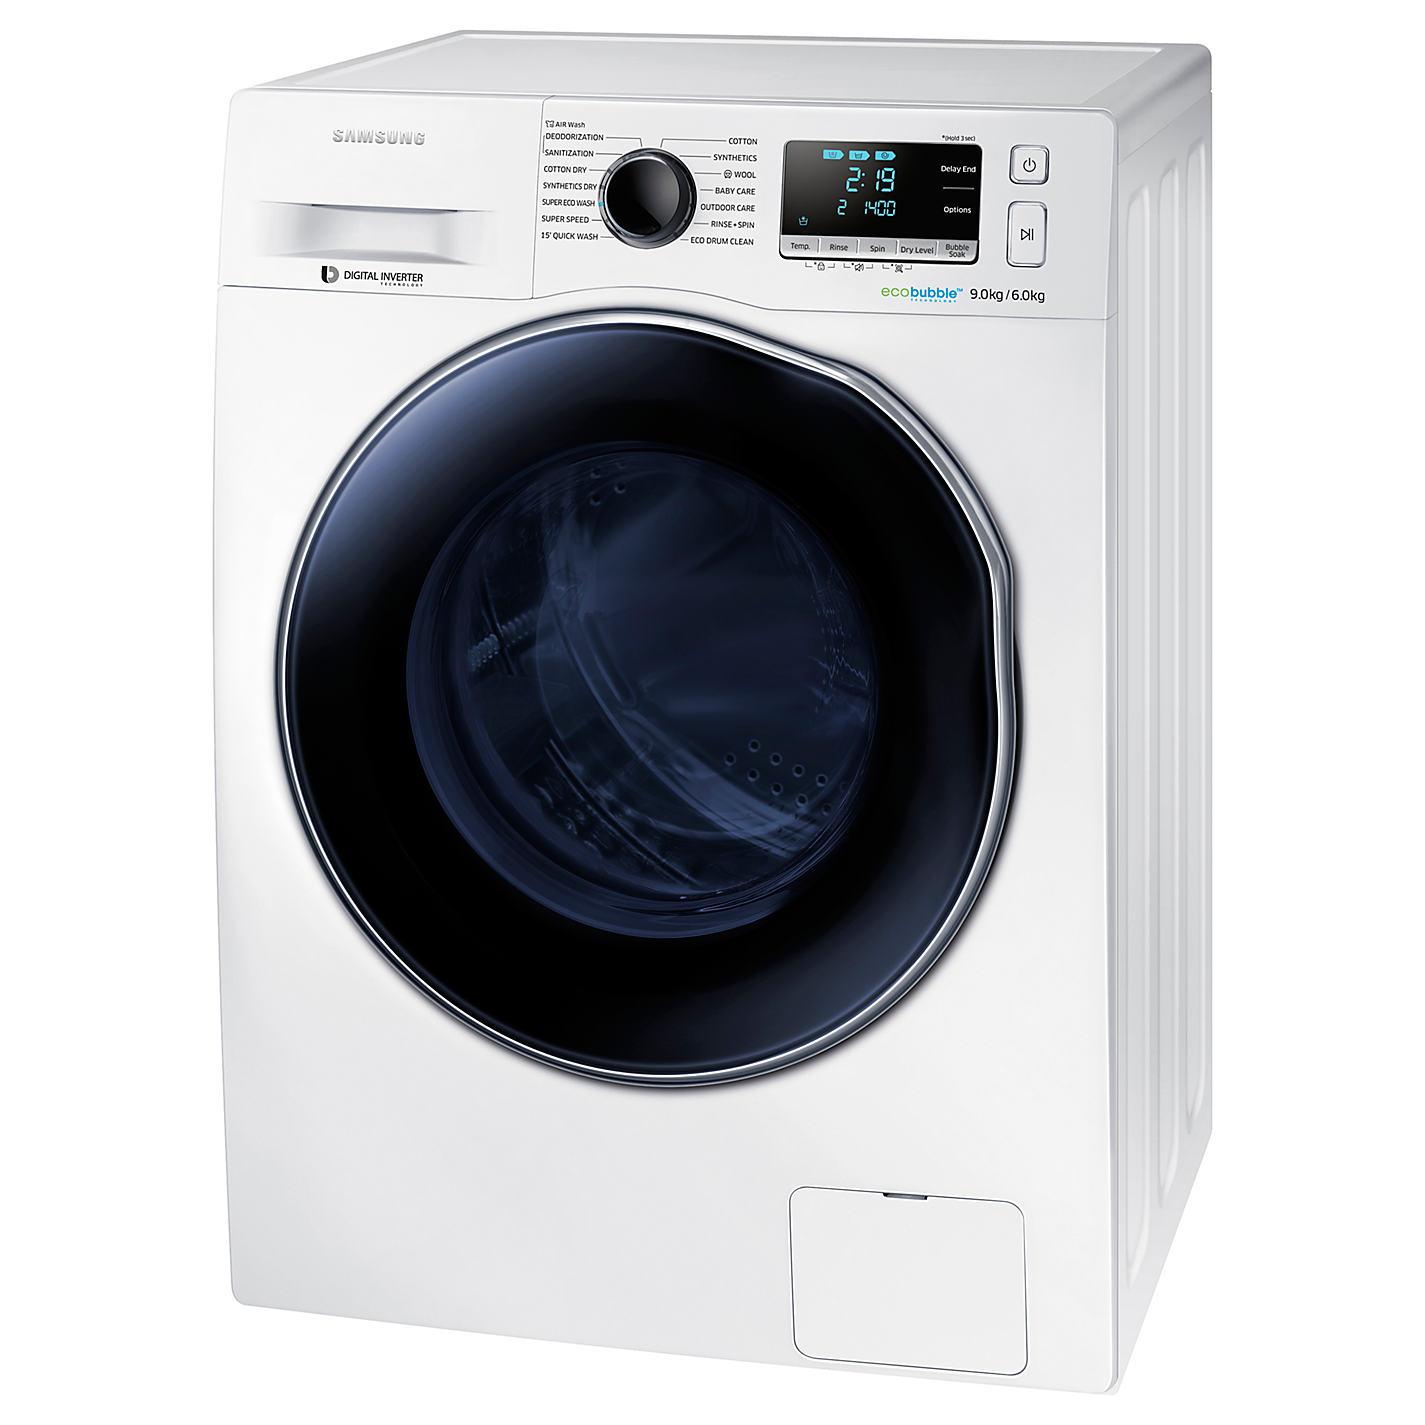 samsung home appliance 5 year warranty multiplybtc